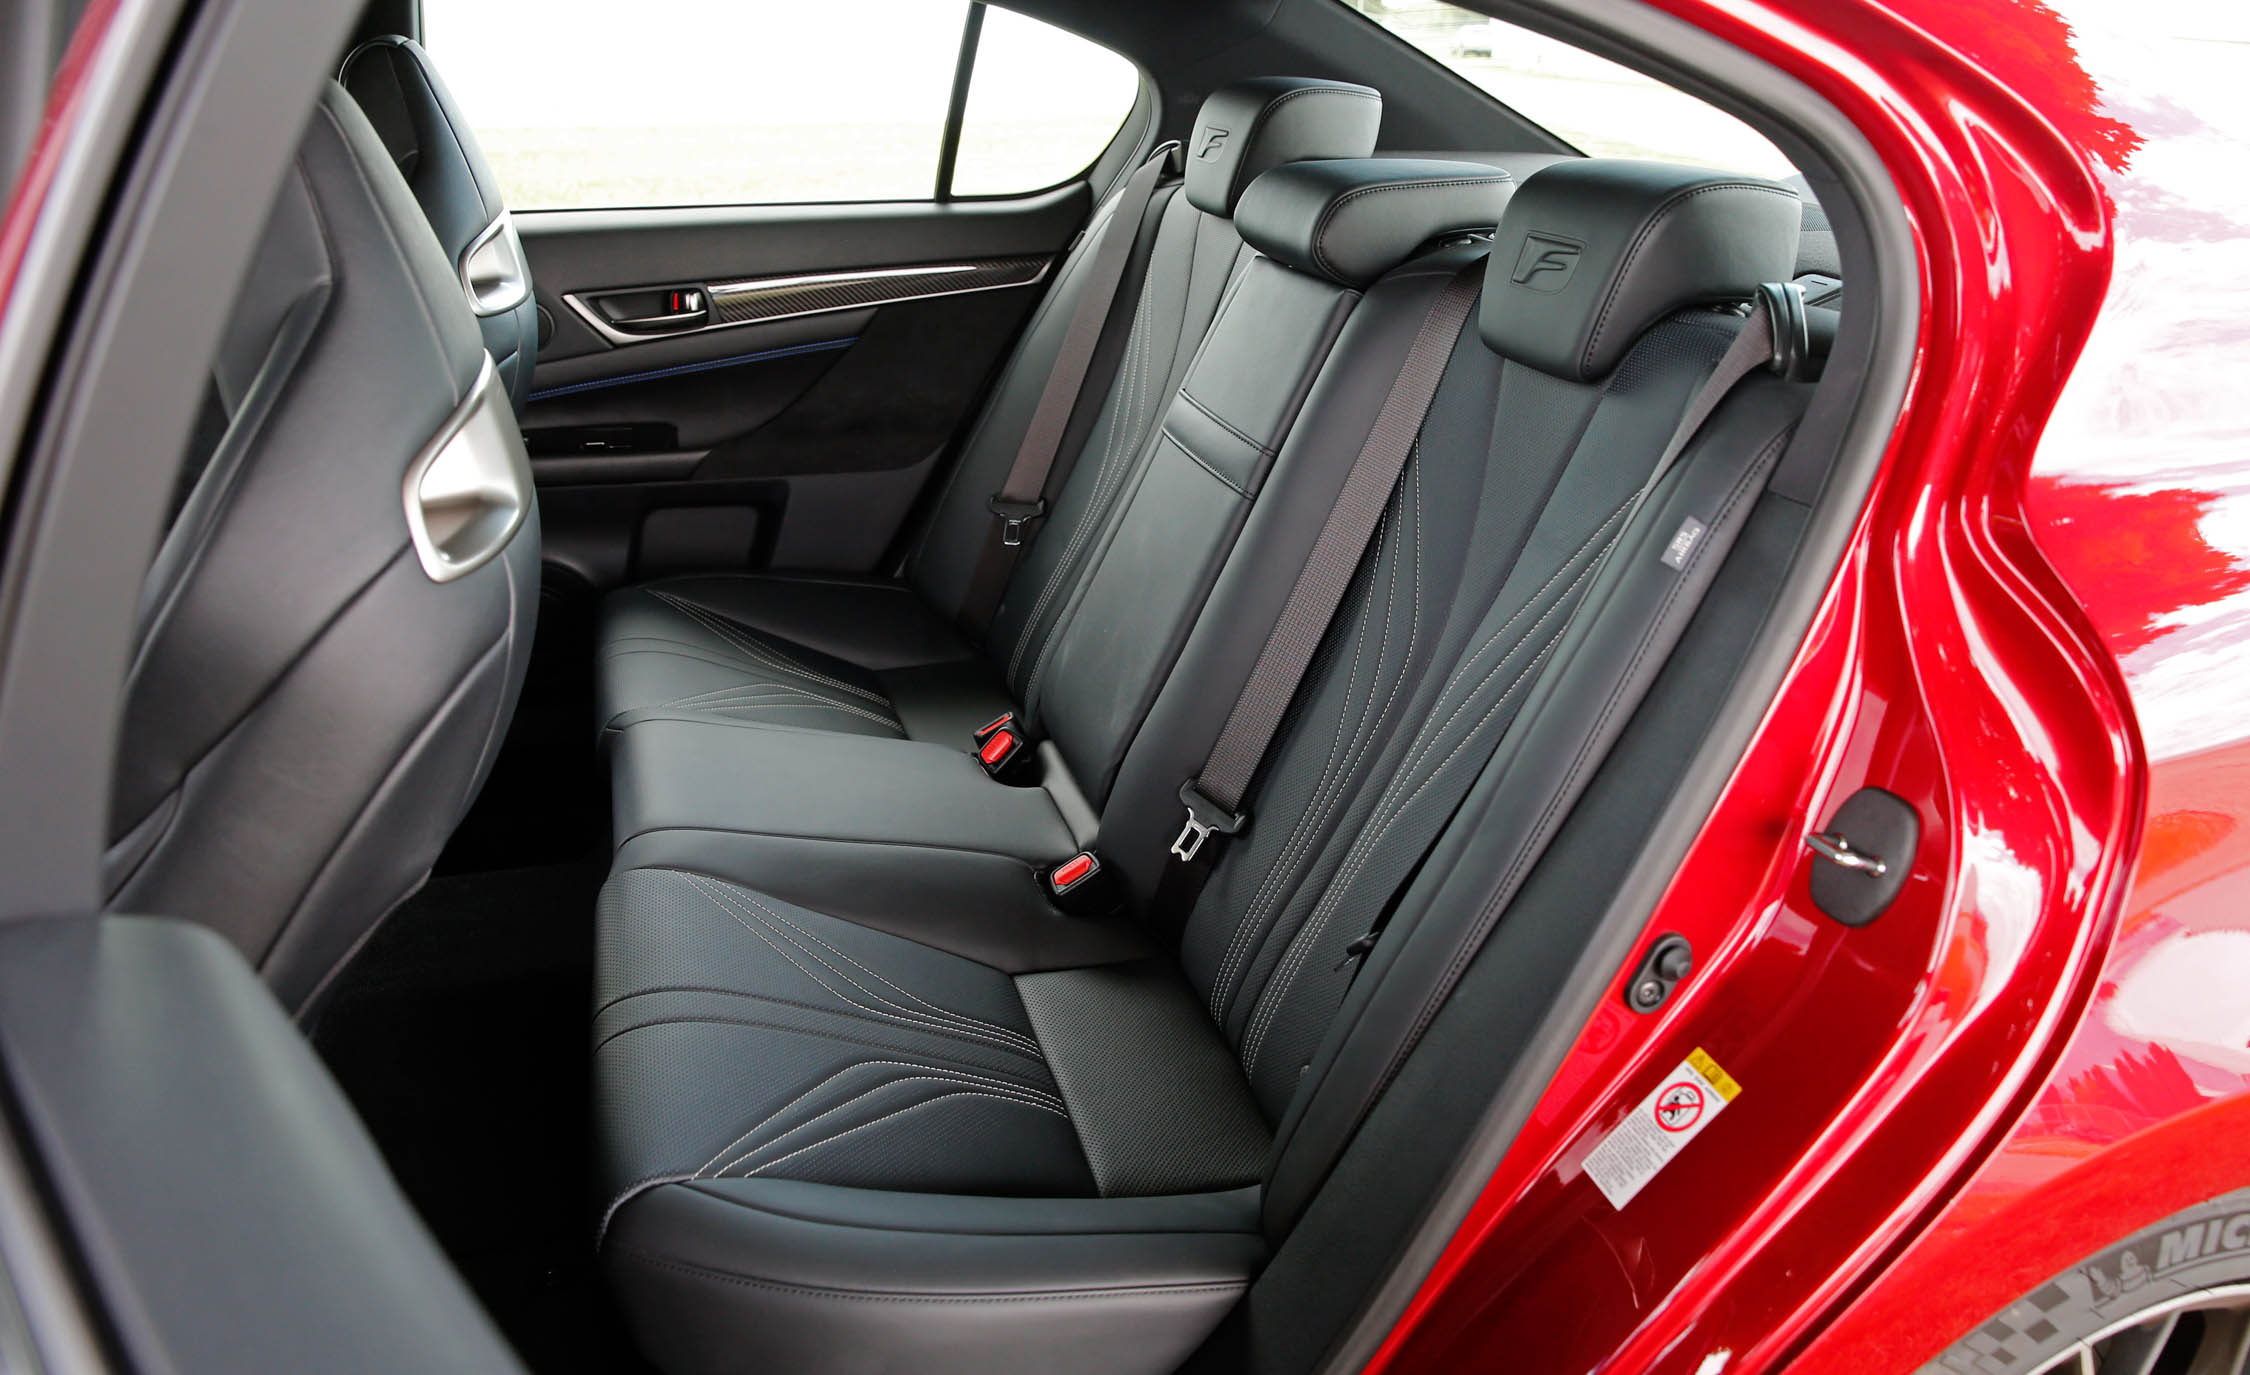 2016 Lexus Gs F Interior Seats Rear (Photo 9 of 20)